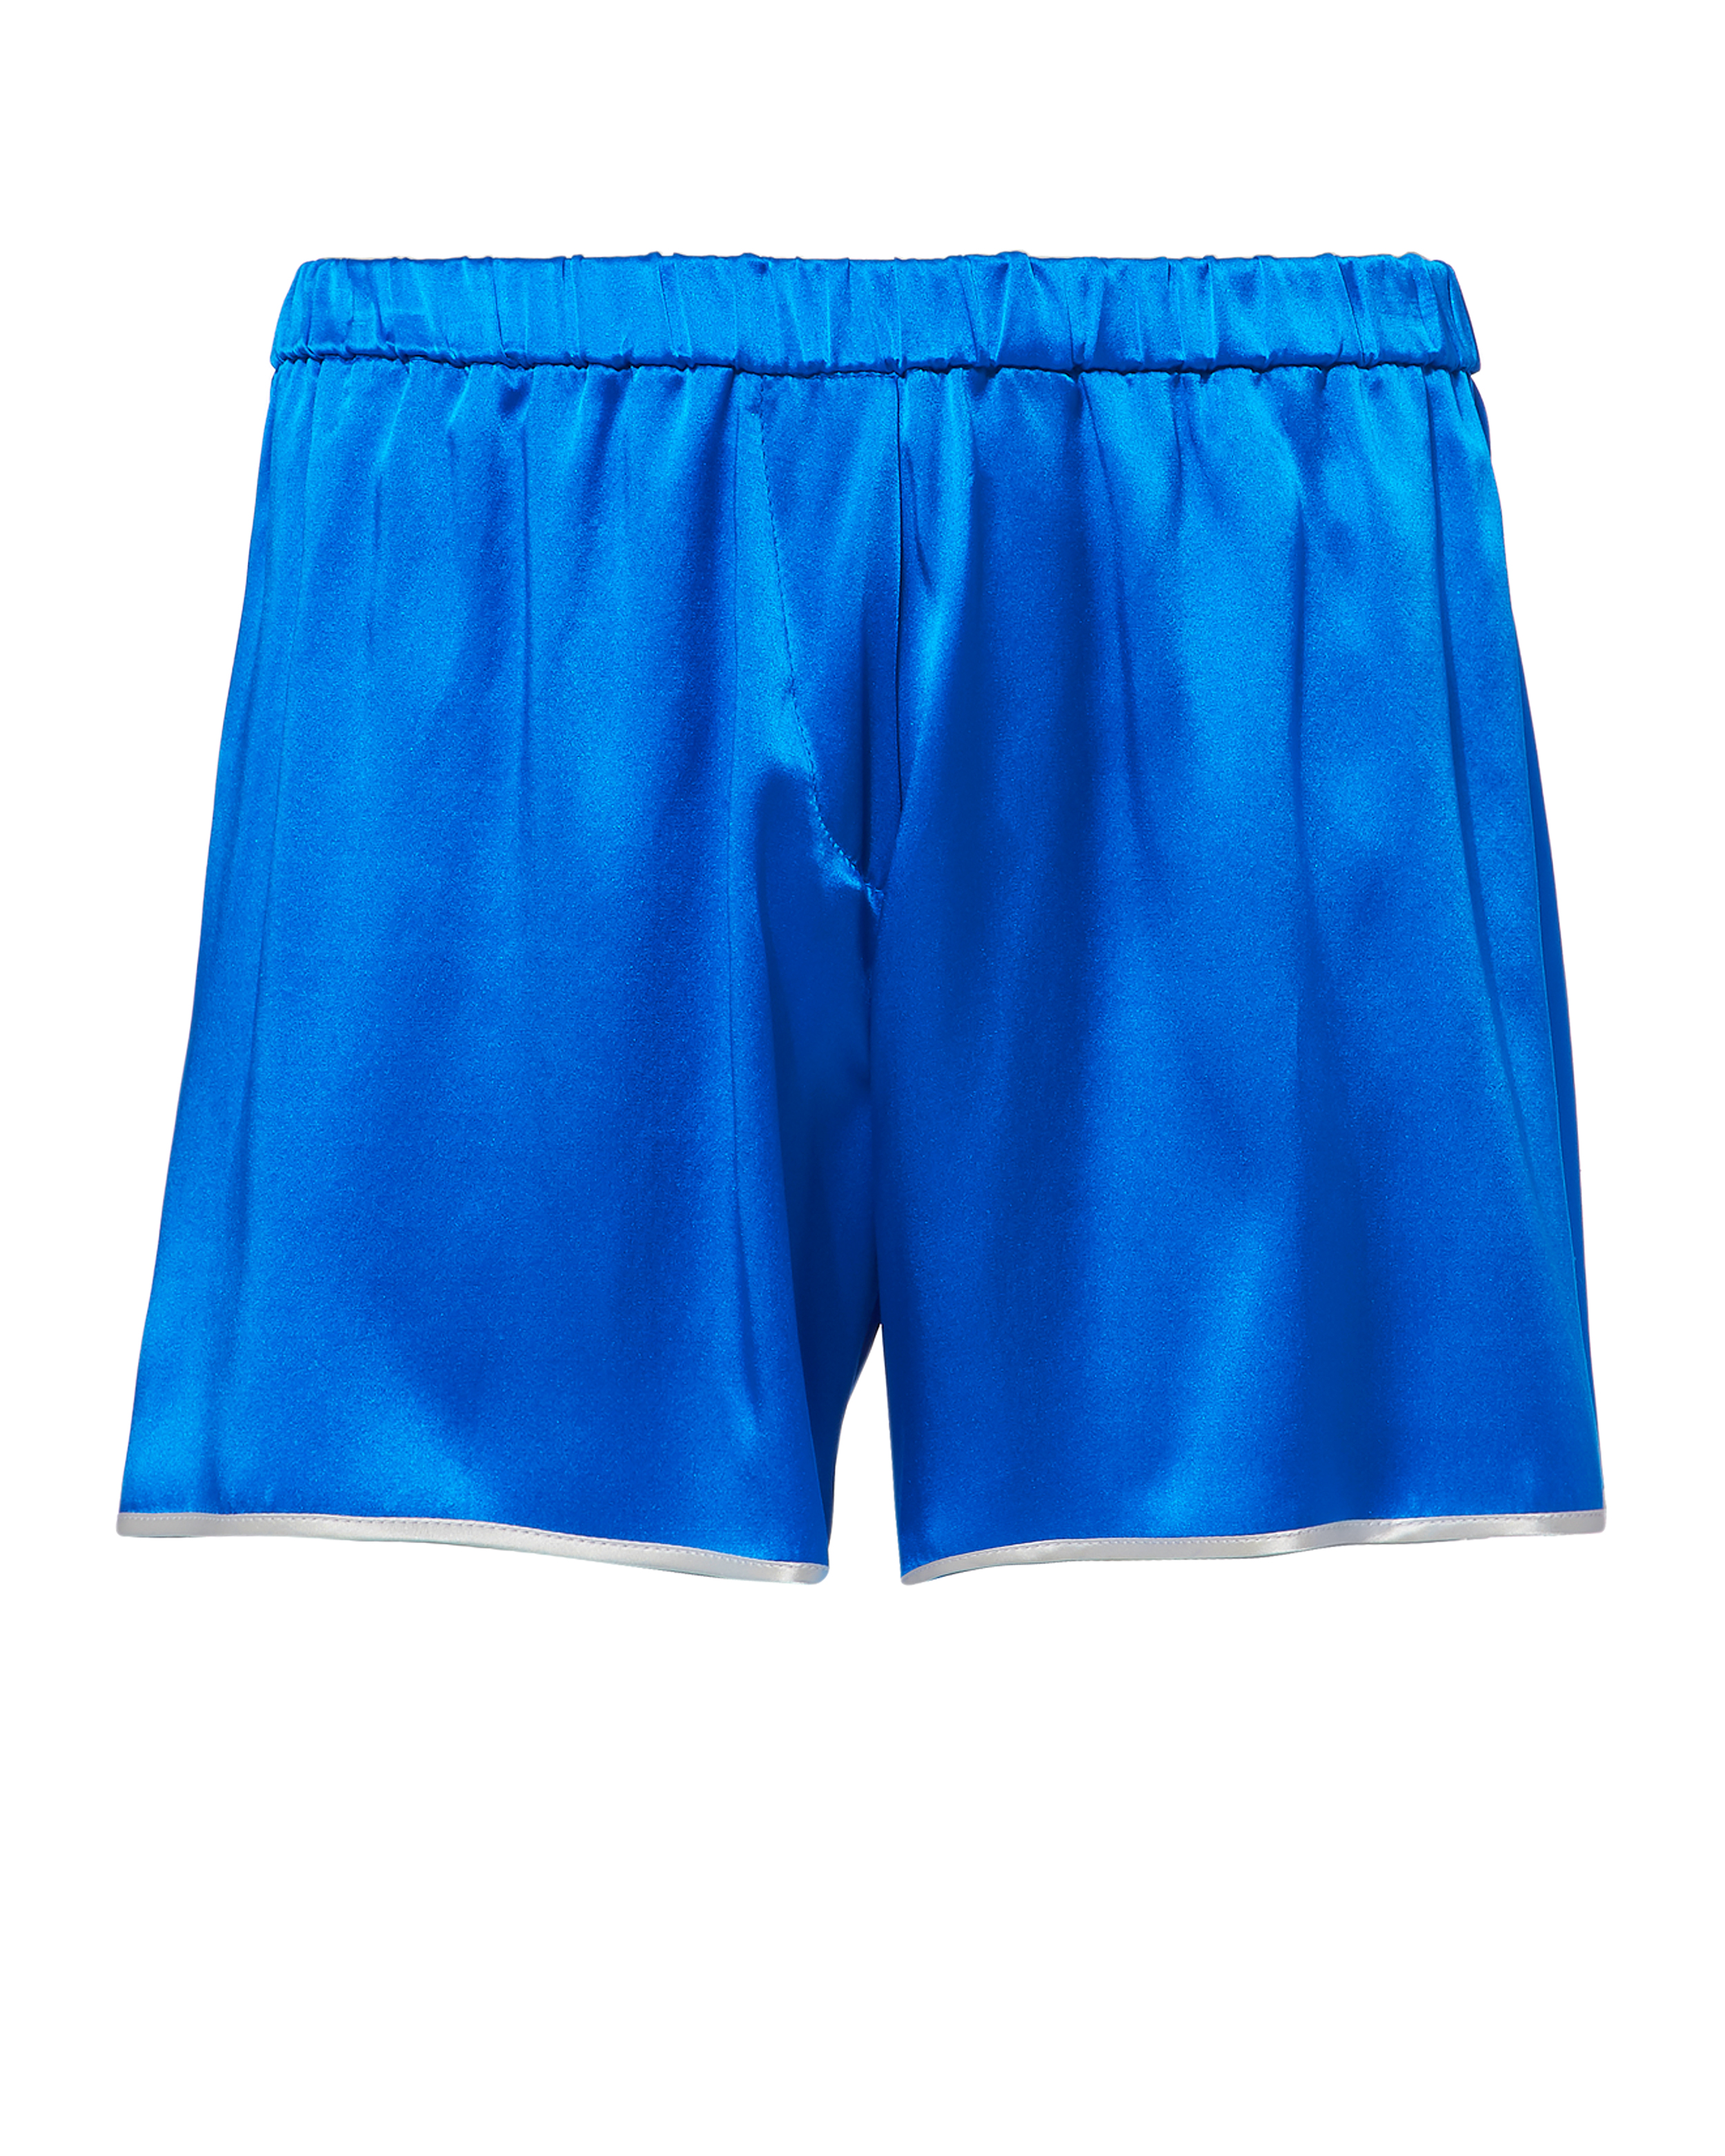 Lenya Silk Shorts by Alexis